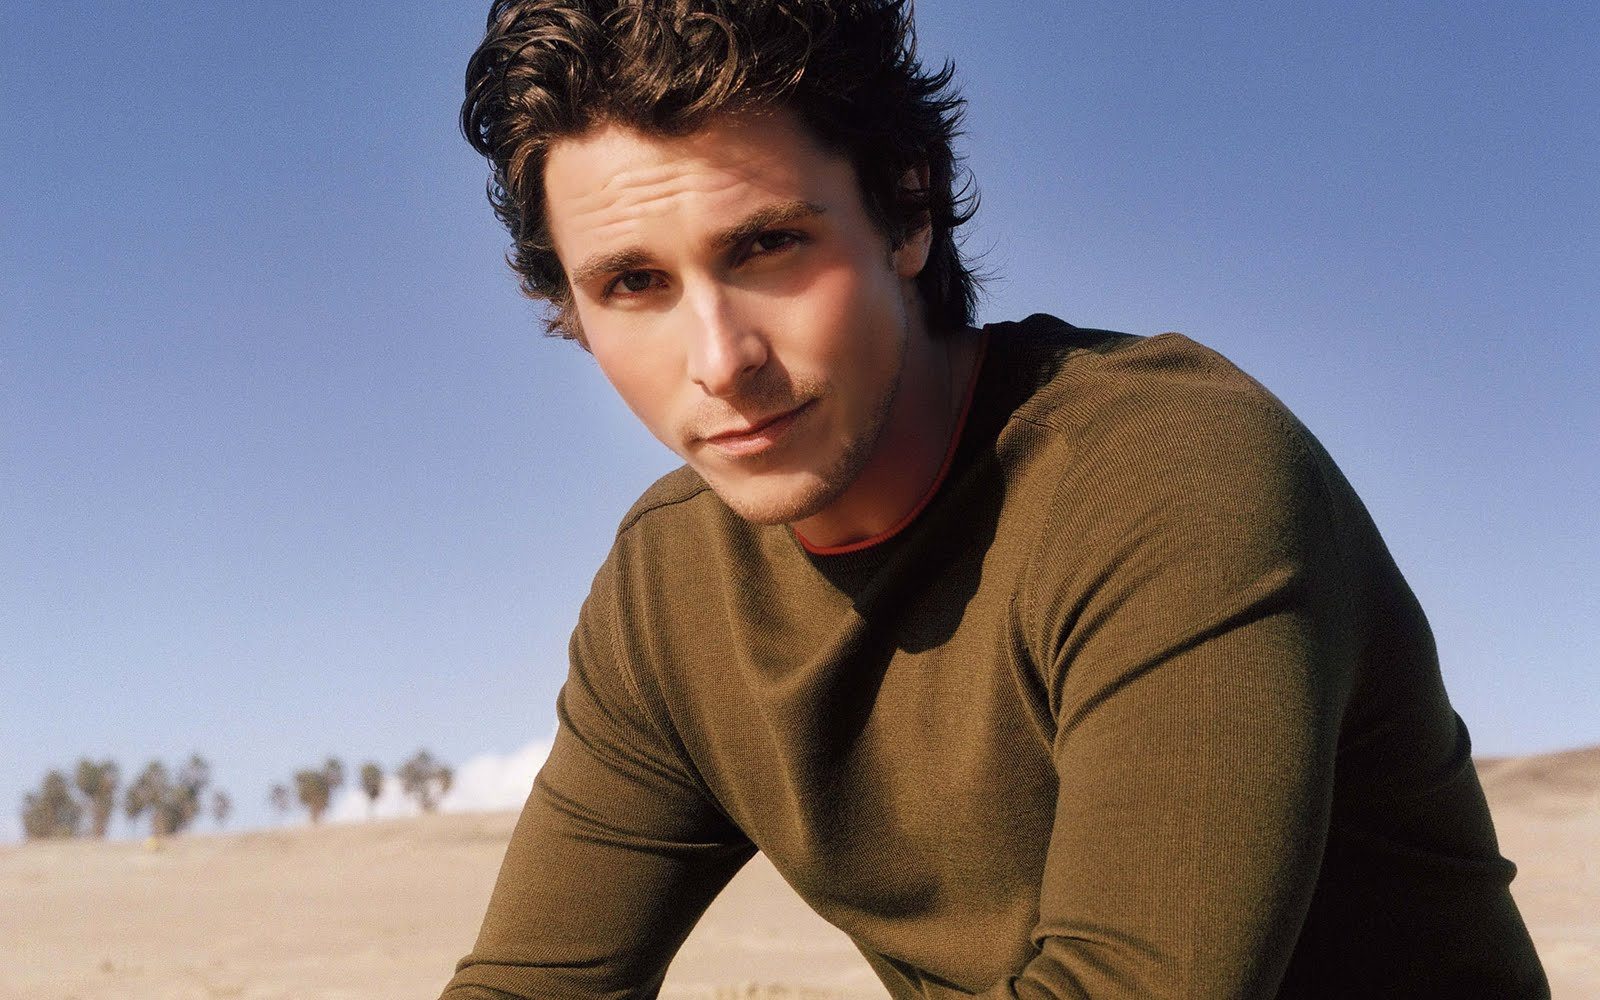 de Imagenes Gratuitas: Christian Bale - Modelos - Rostros de hombres ...